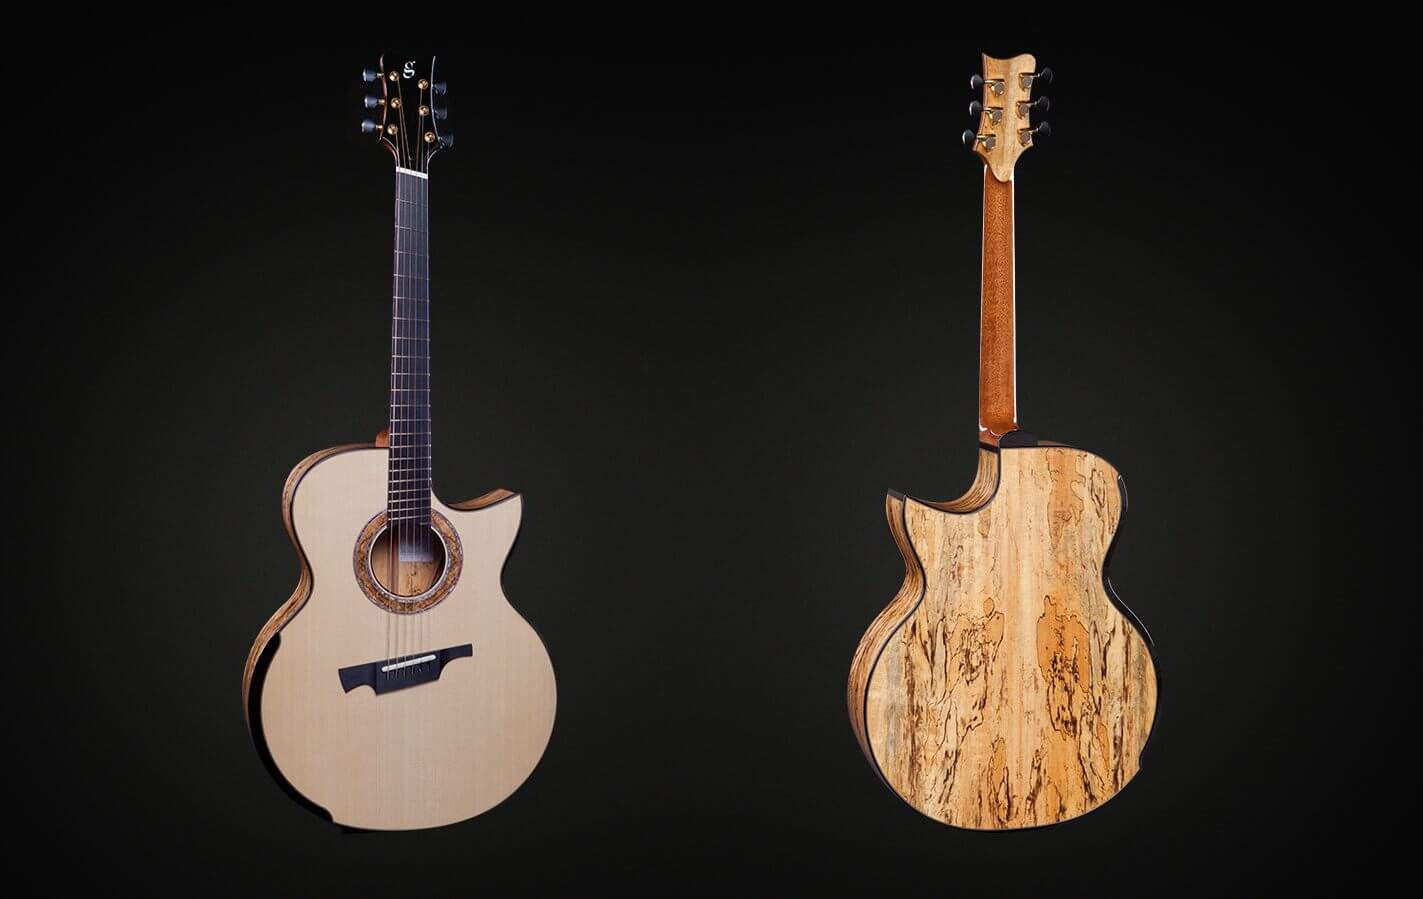 Greenfield Guitars | Fine handmade Acoustic Guitars Model G4, Adirondack red spruce, spalted Manchinga, laskin arm rest, Florentine cutaway, DADGAD fanned frets